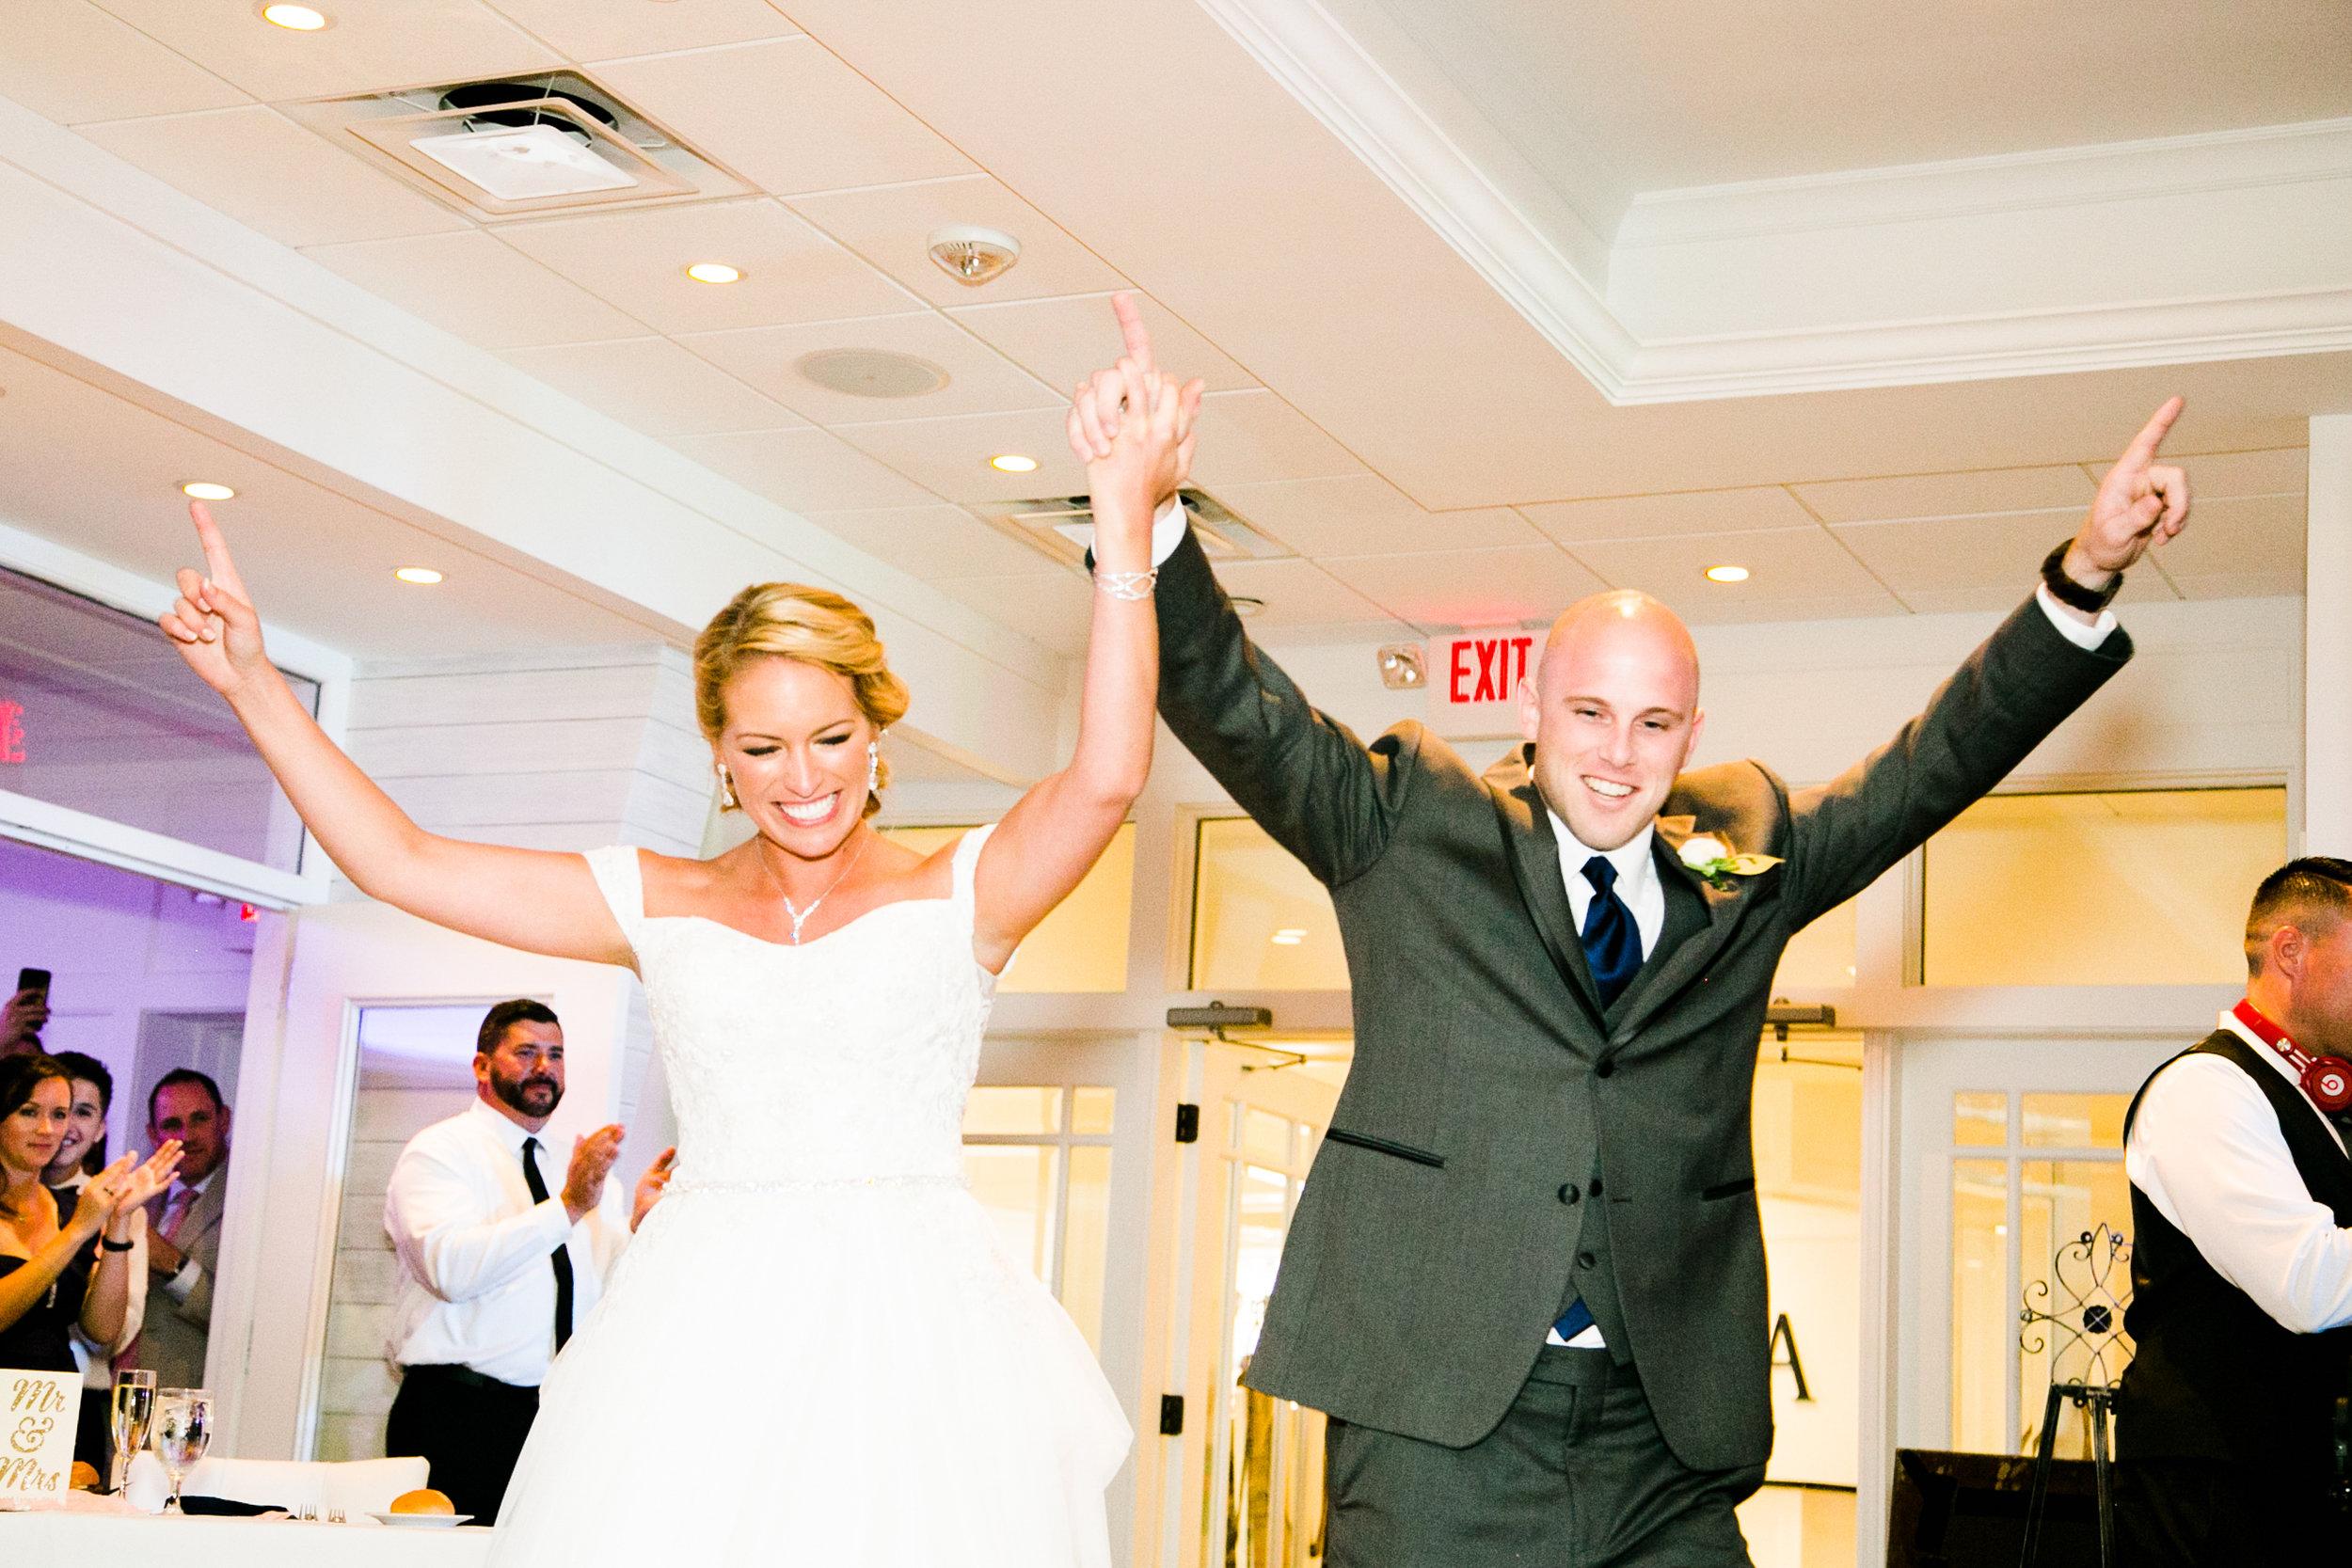 ICONA GOLDEN INN AVALON NJ WEDDING PHOTOGRAPHY  - 068.jpg